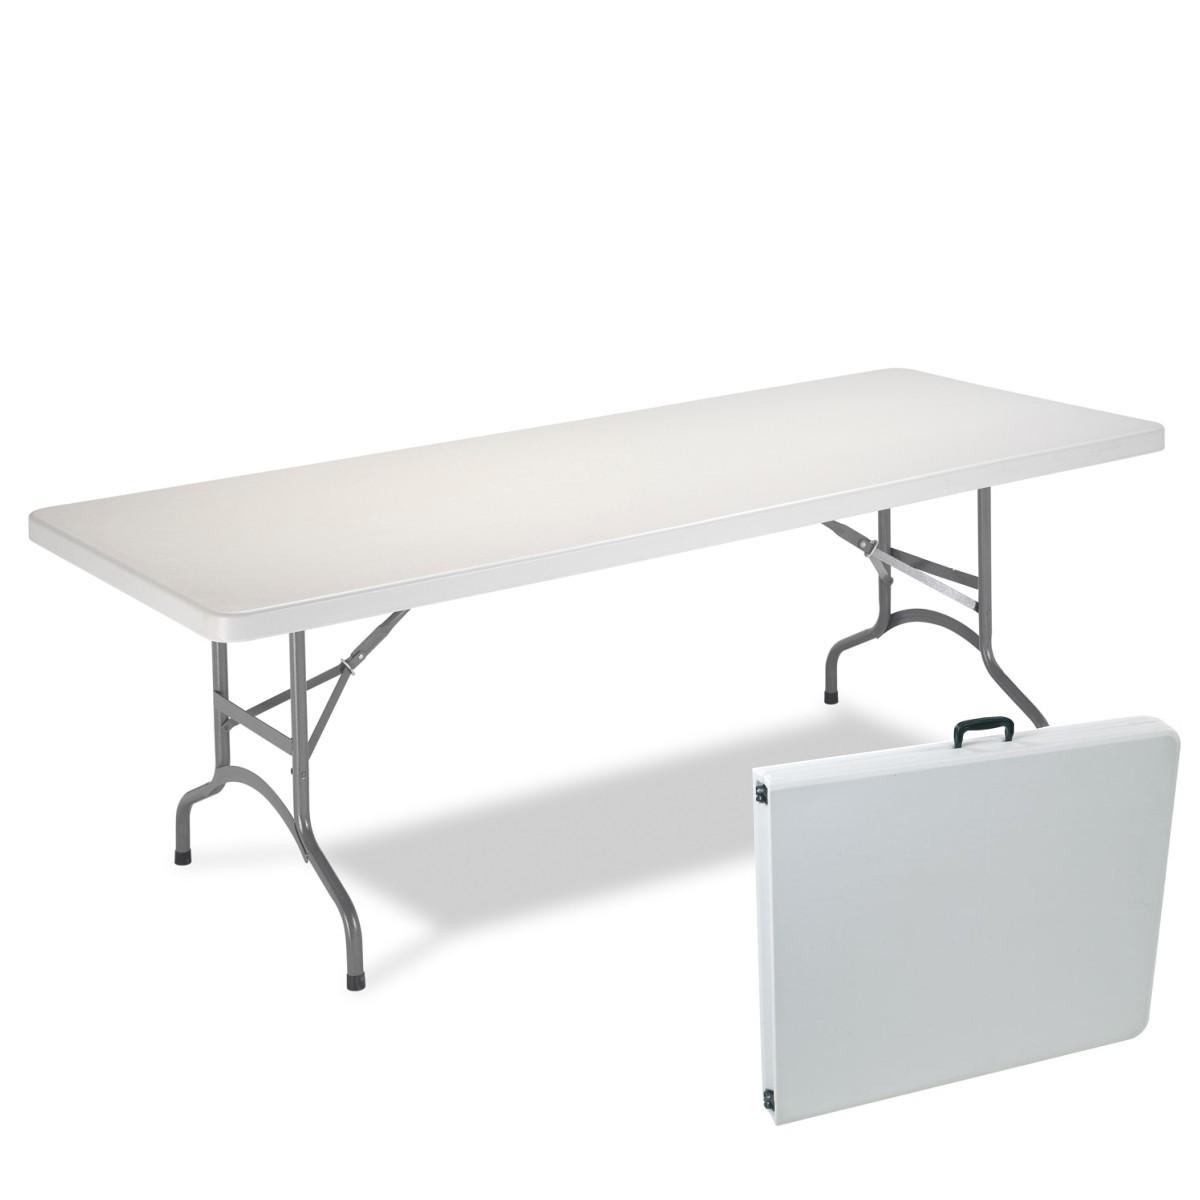 Como hacer mesa abatible pared interesting with como - Hacer mesa abatible ...